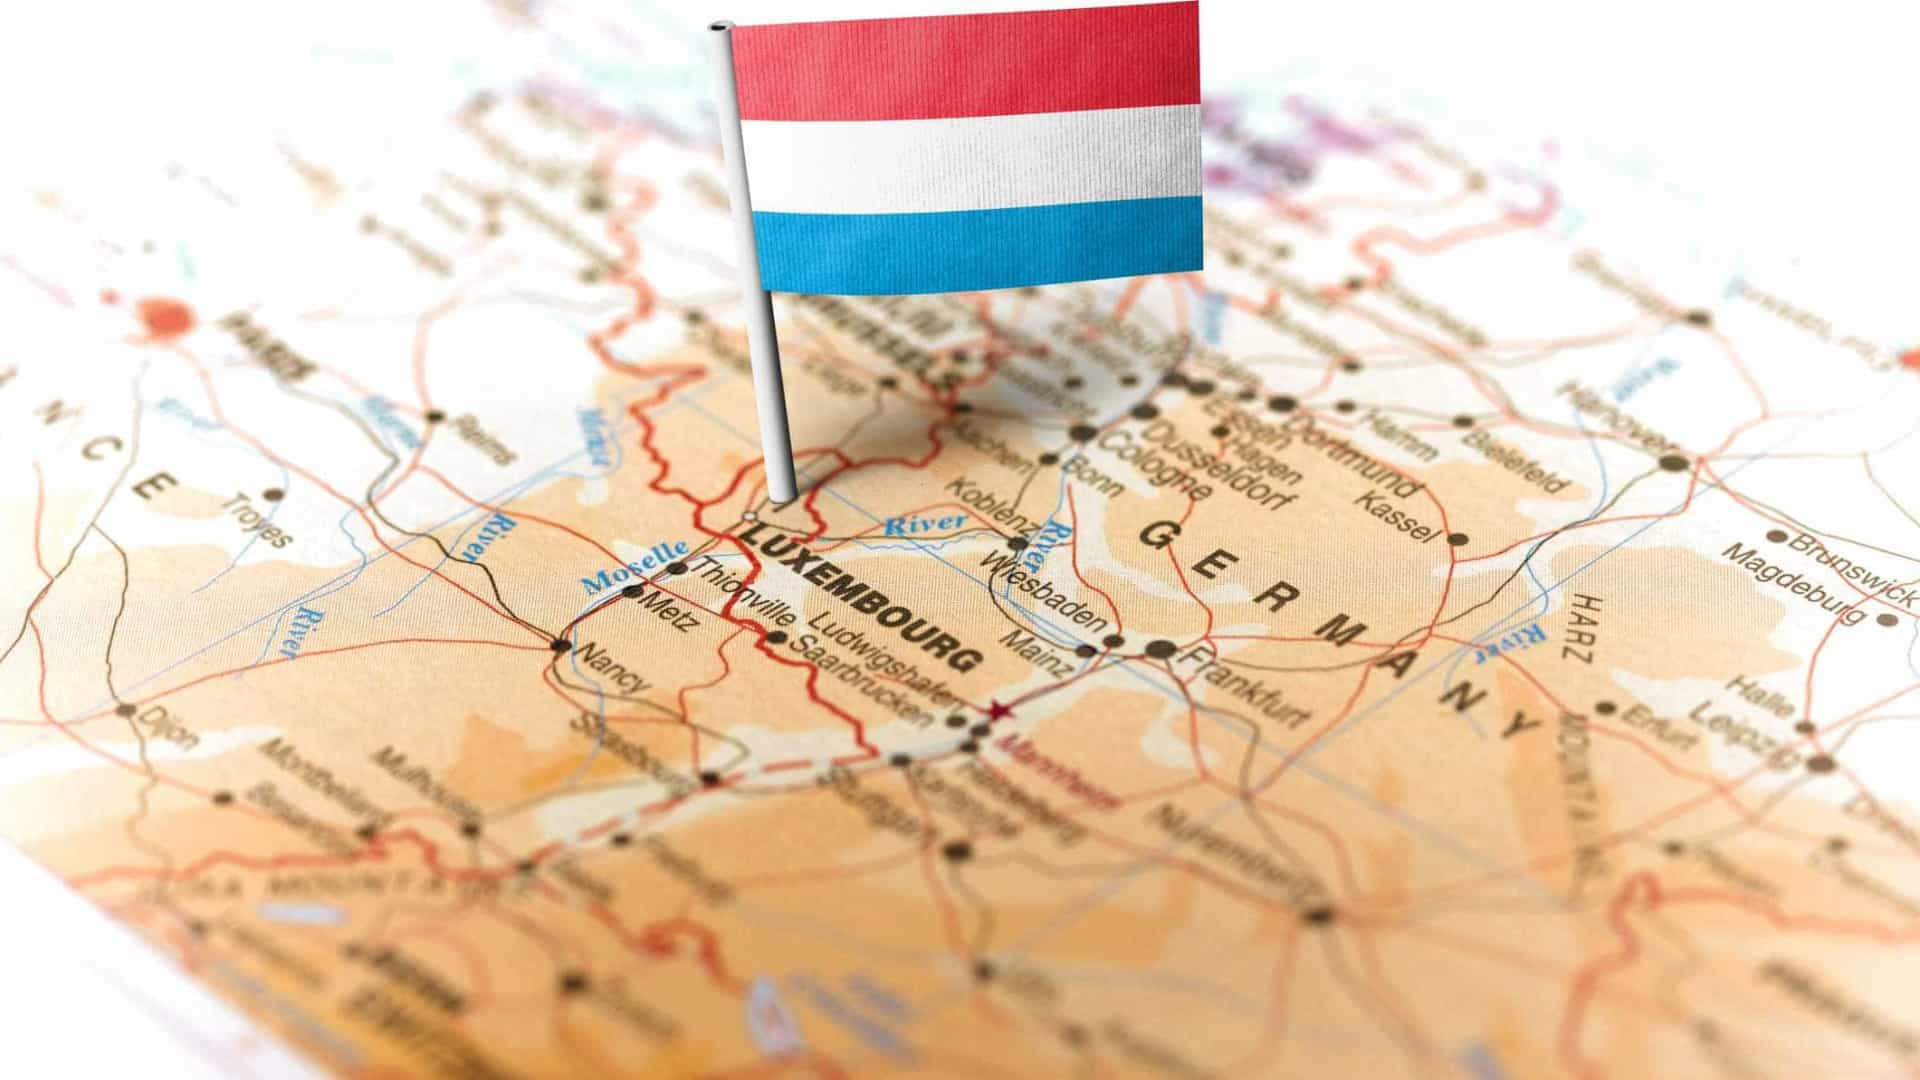 Conselheiro do Luxemburgo perde mandato após denúncia sobre residência